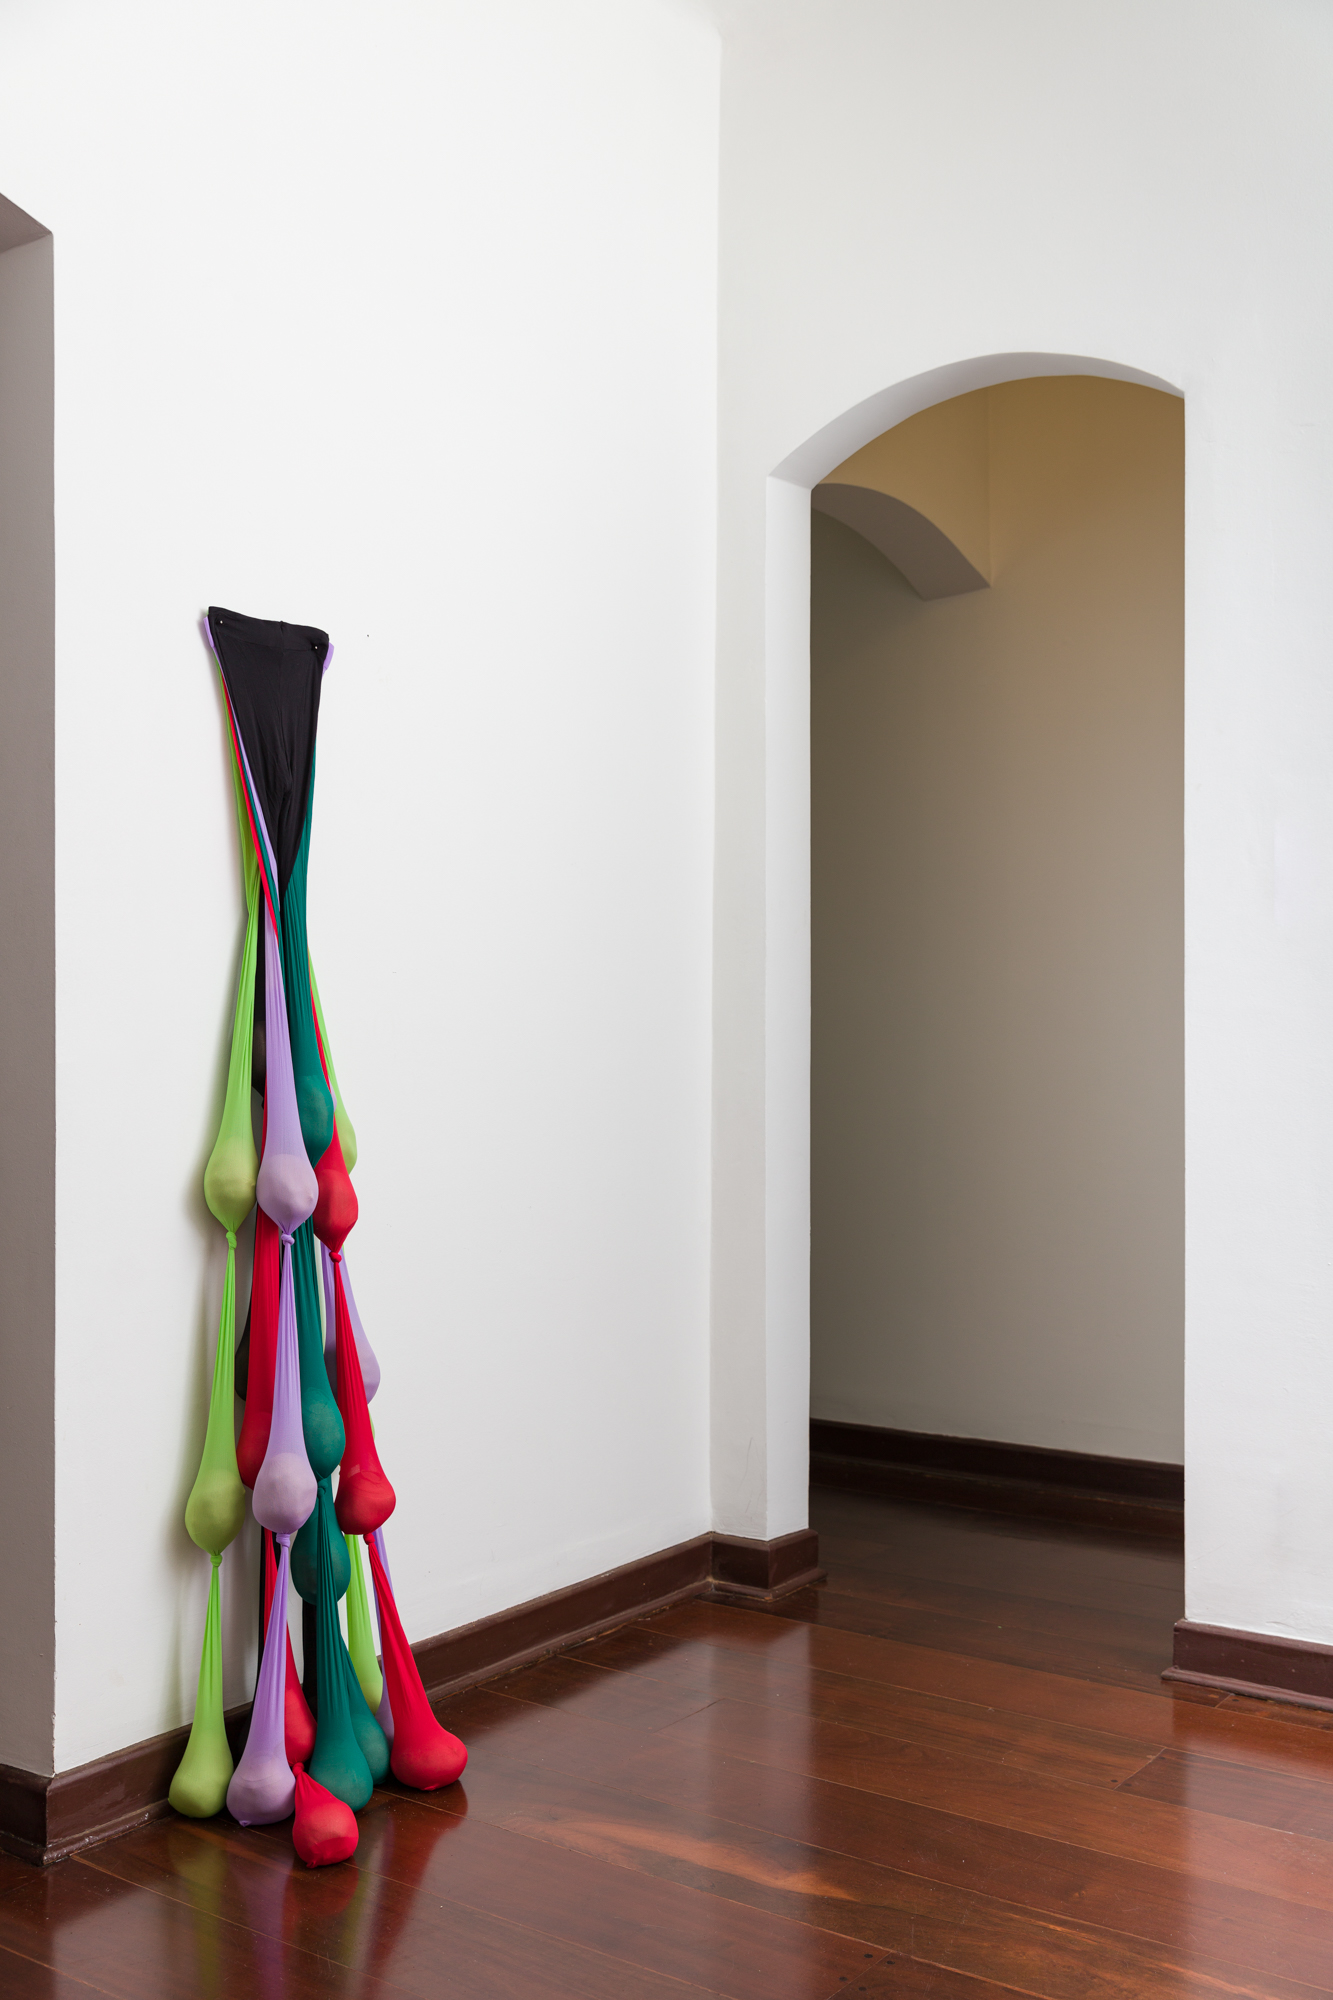 Maria Mijona, 2021. Série Moles. Nylon, areia, e prego. 168x65x28cm